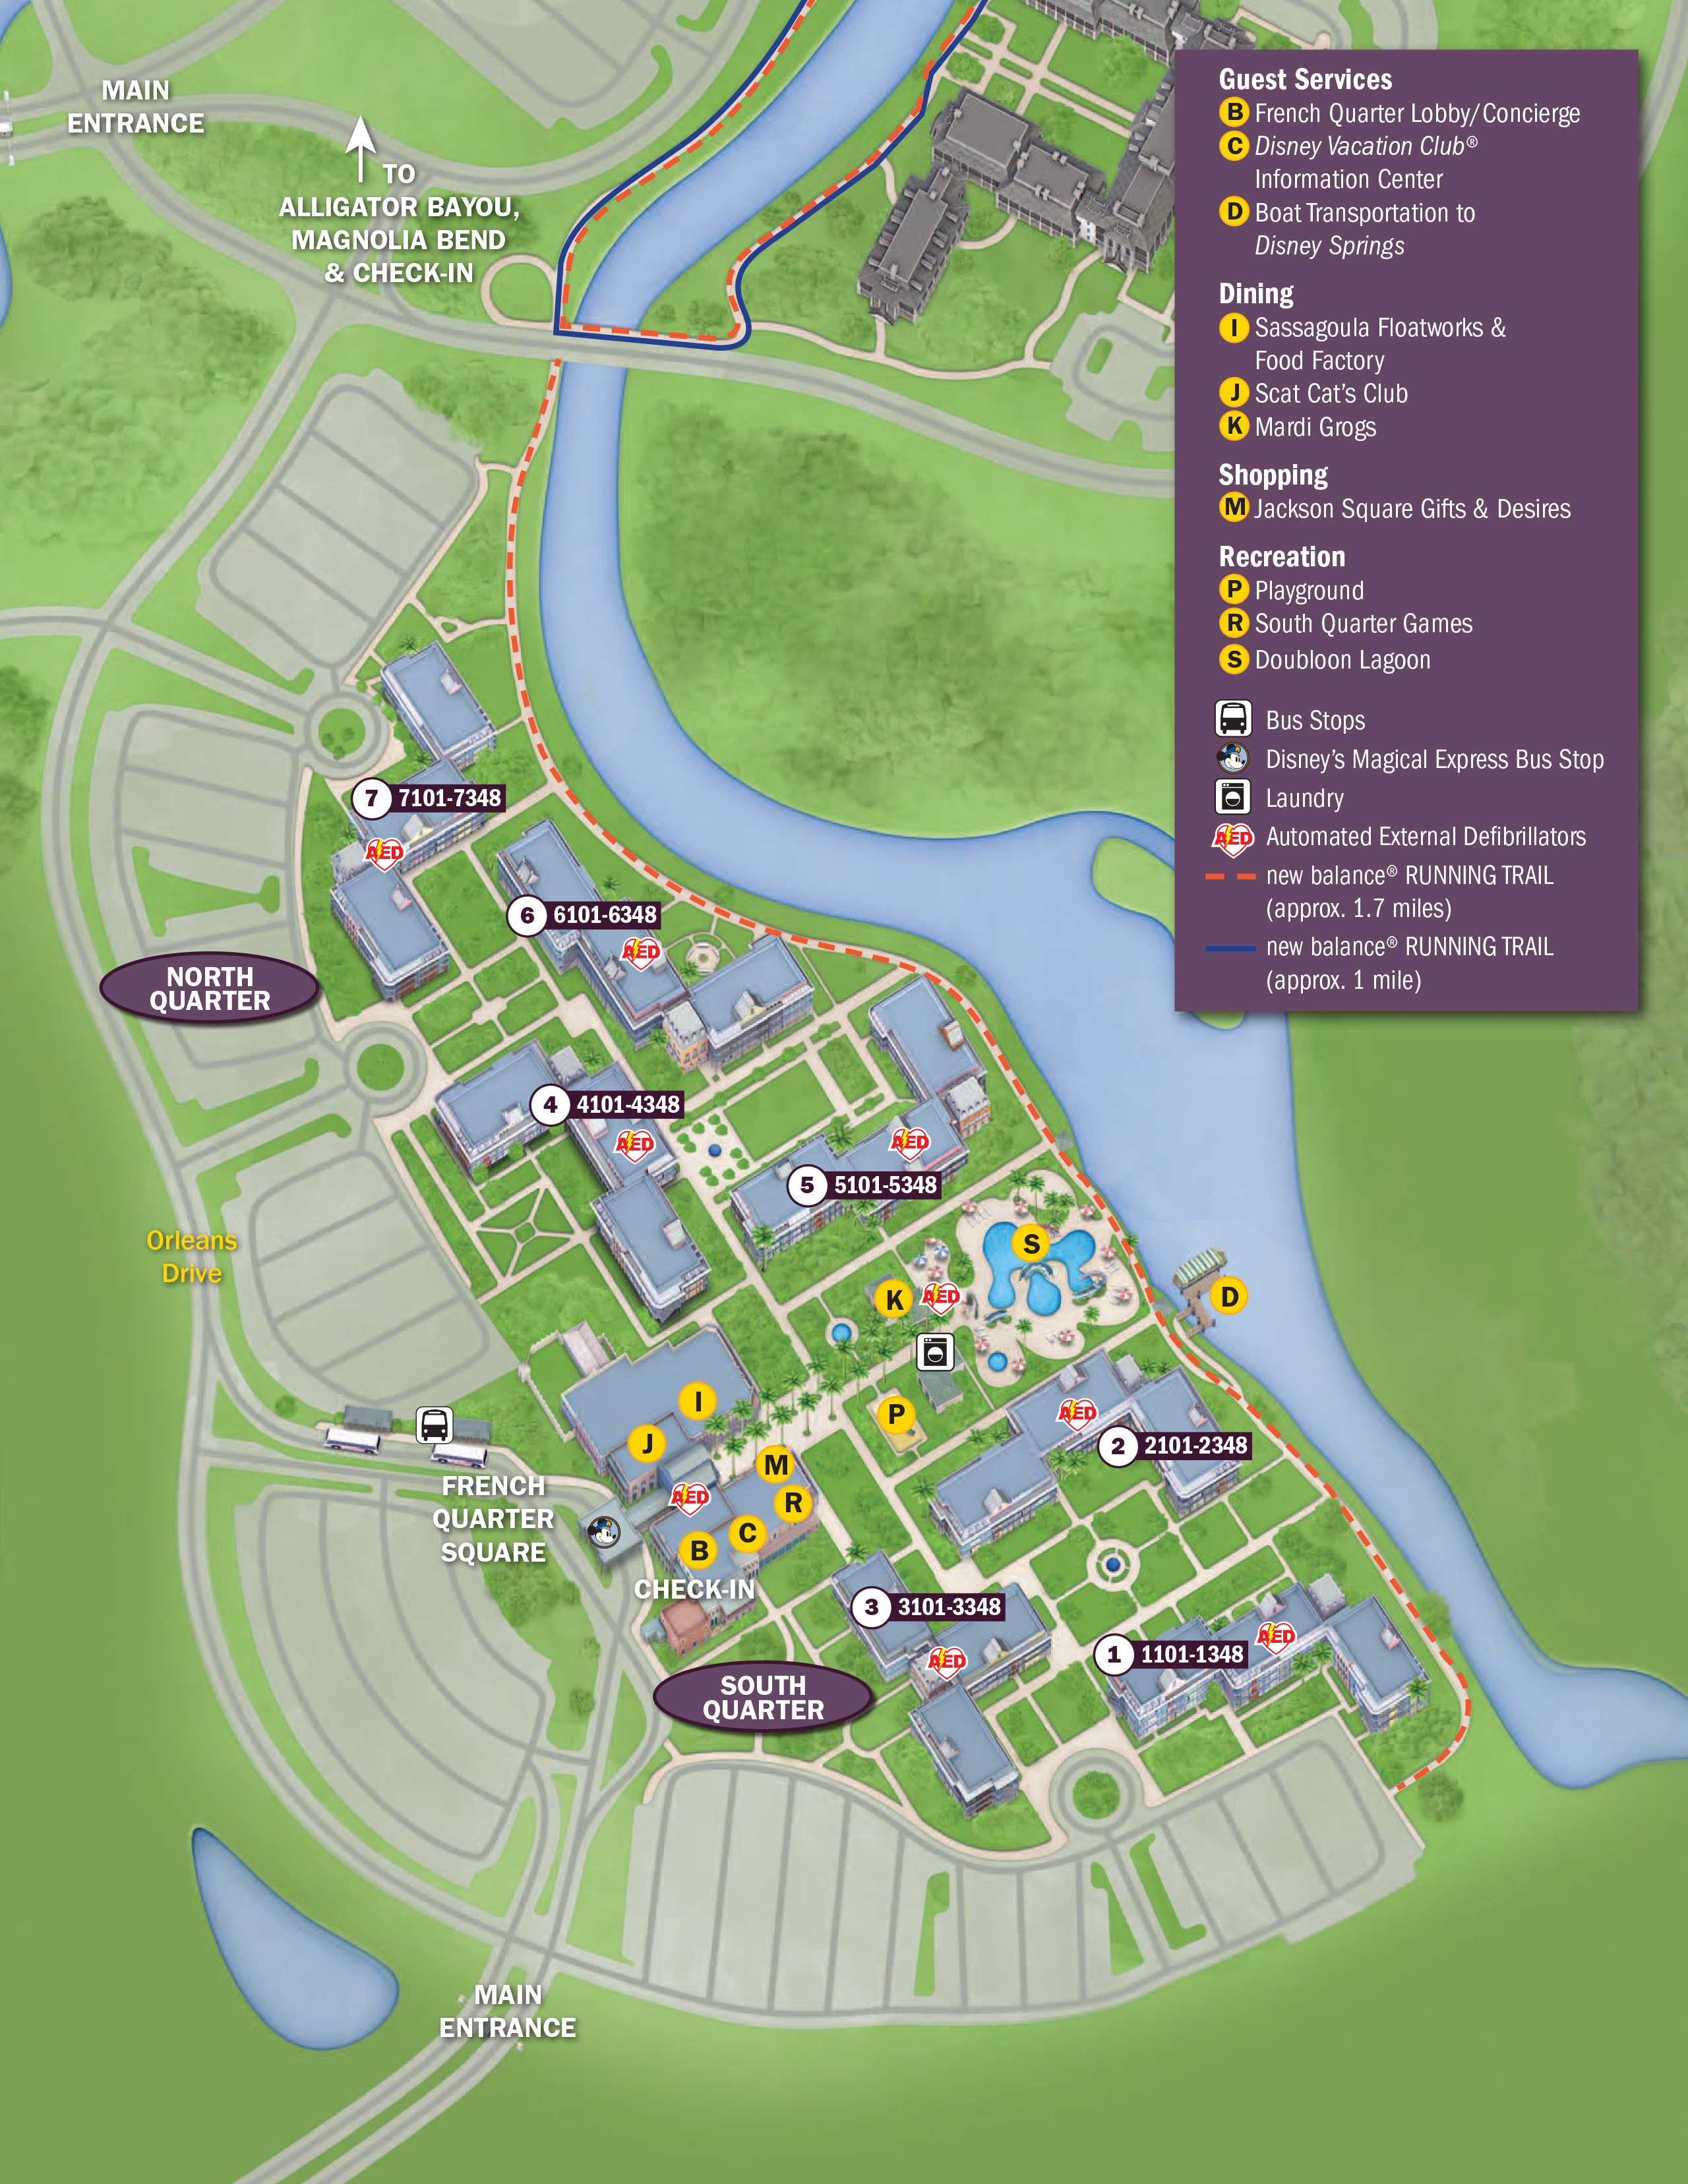 April 2017 Walt Disney World Resort Hotel Maps Photo 10 of 33